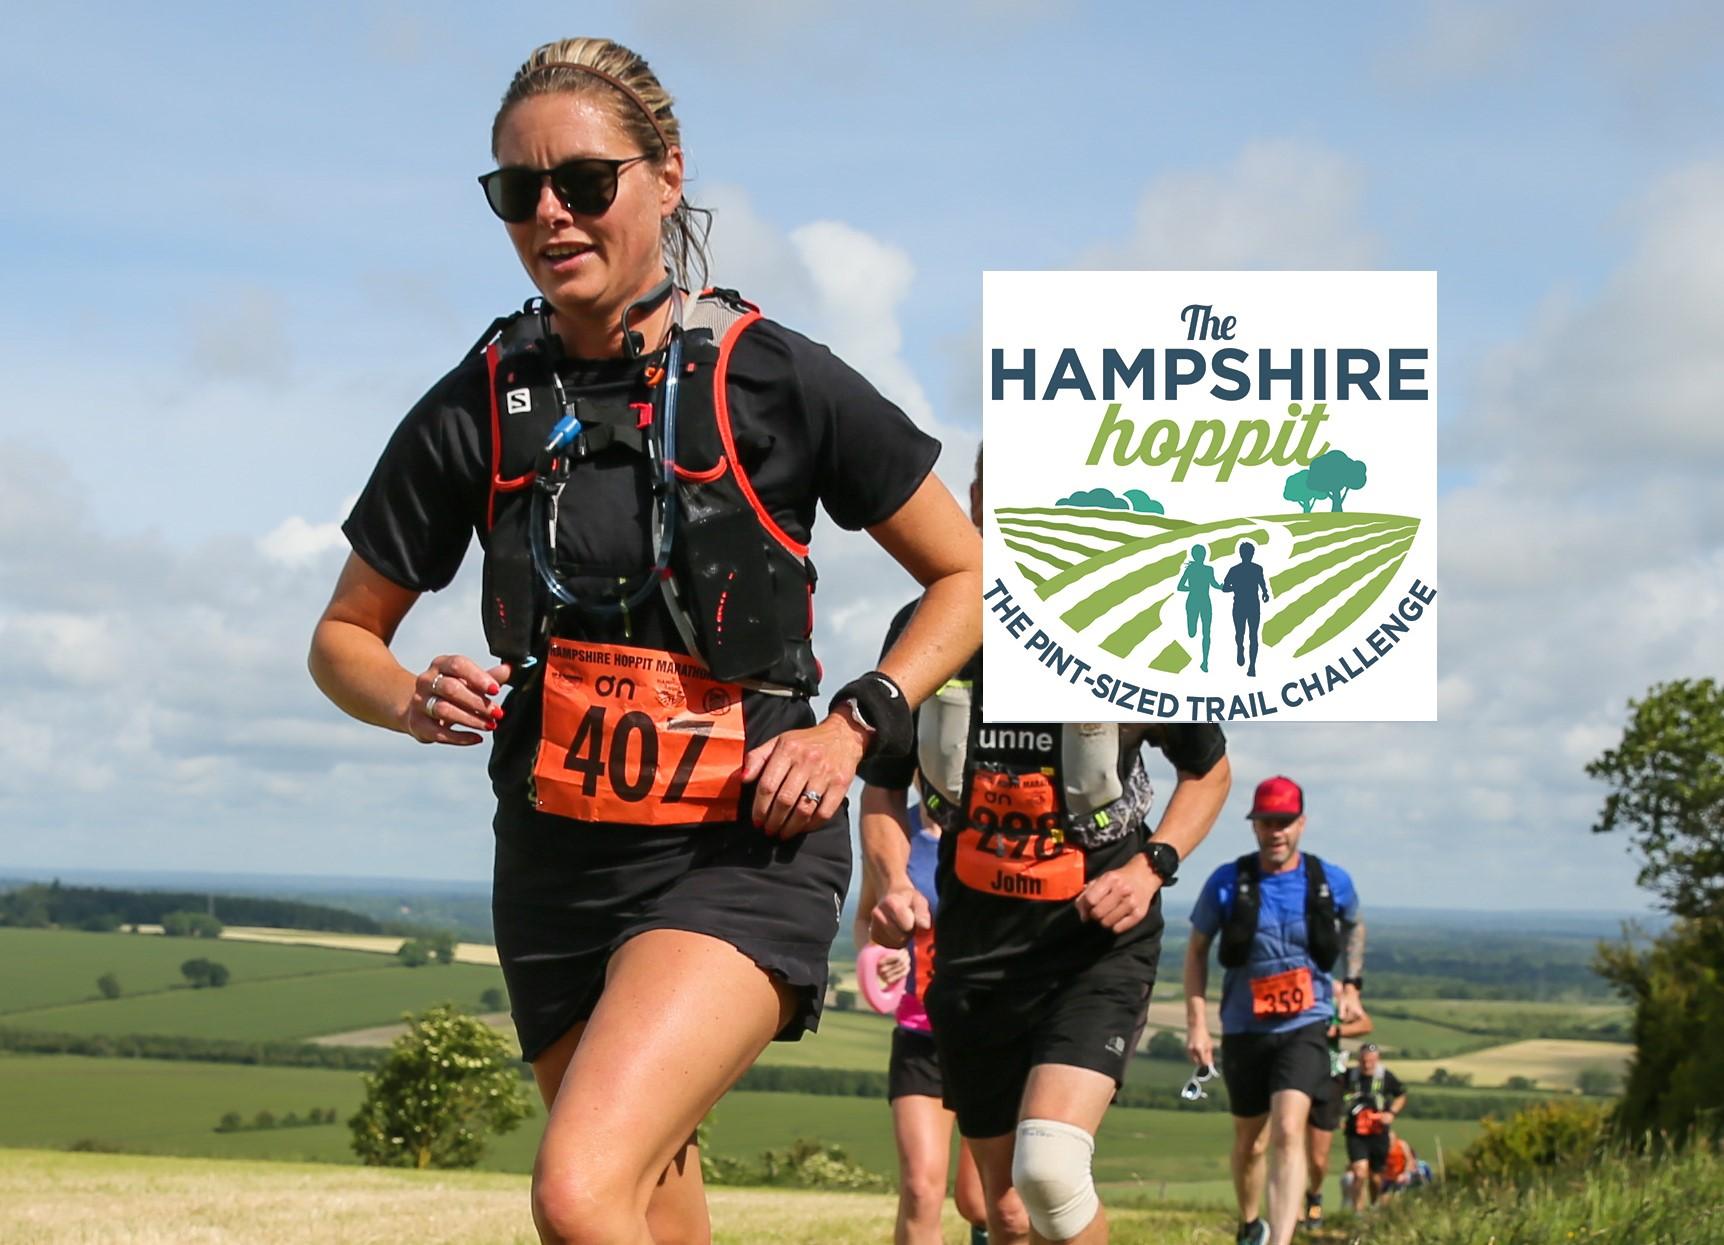 The Hampshire Hoppit Trail Marathon - cover image